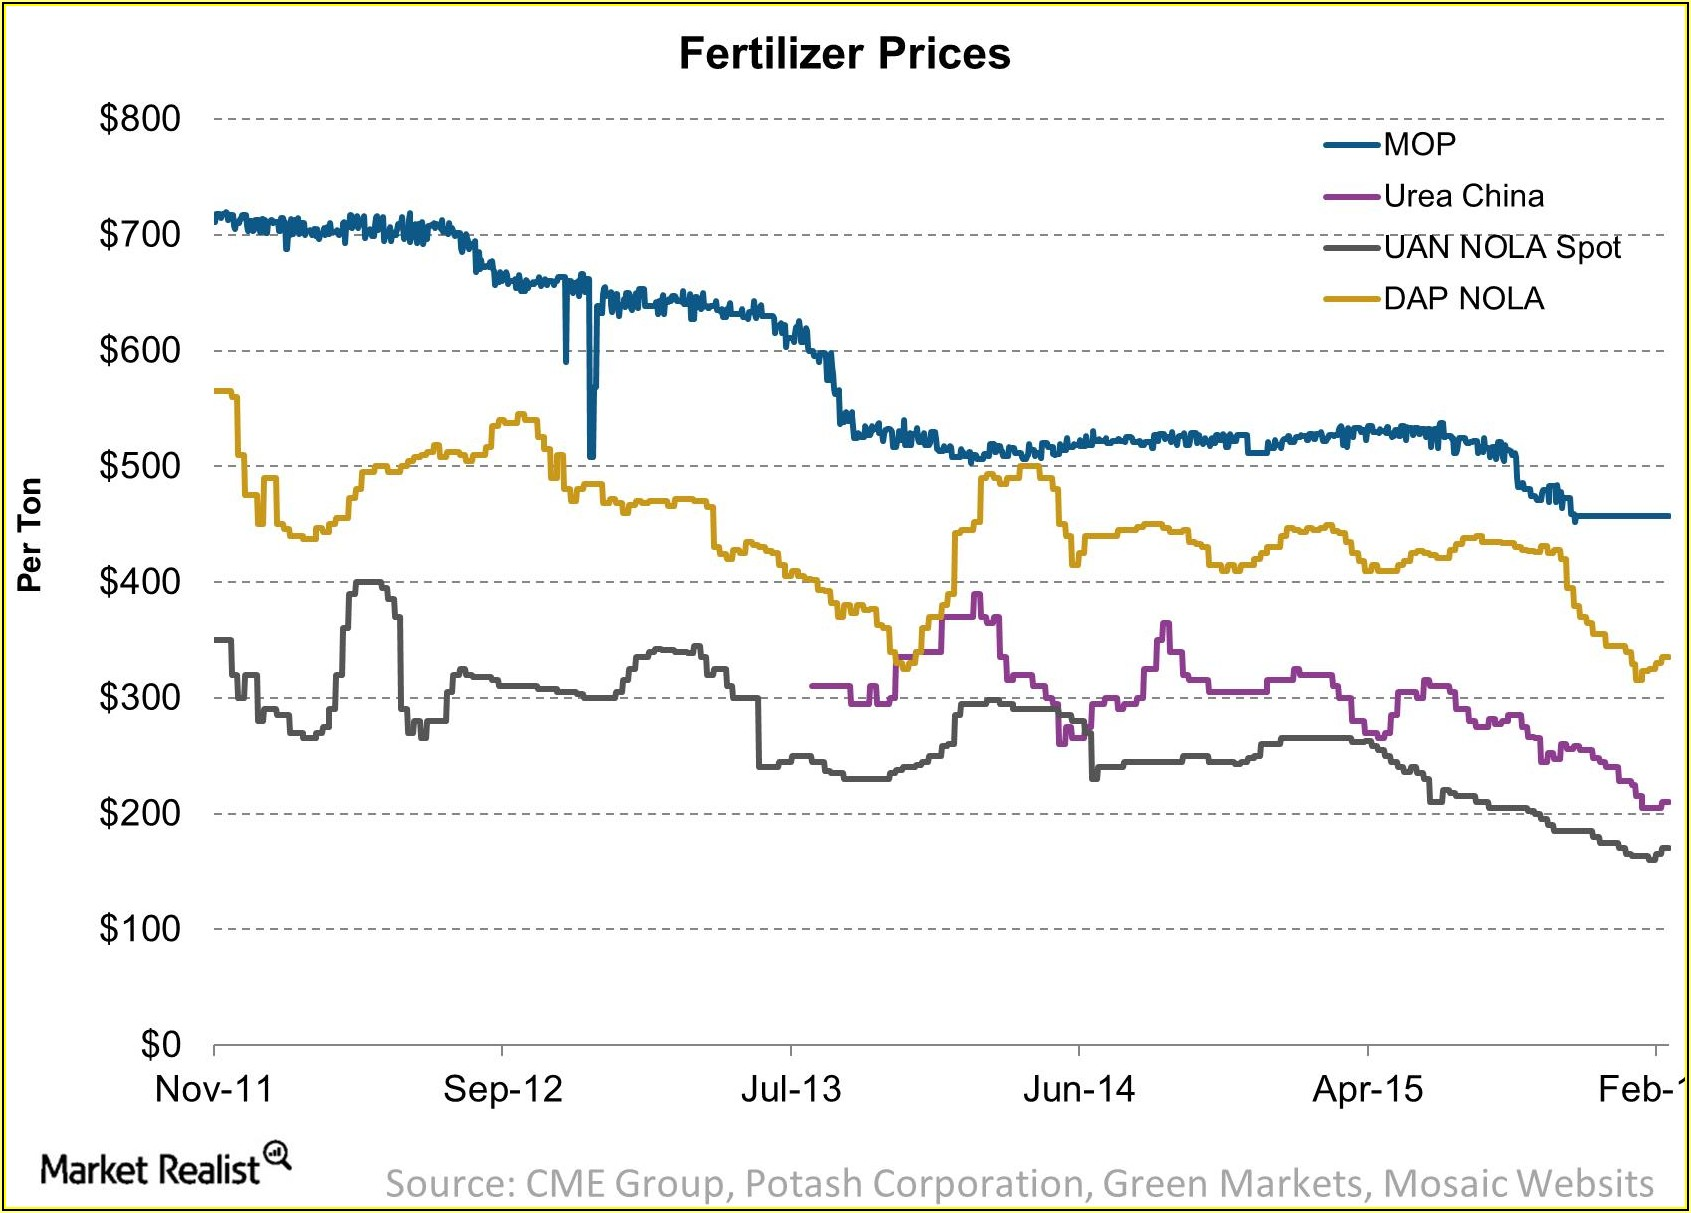 Current Map Fertilizer Prices